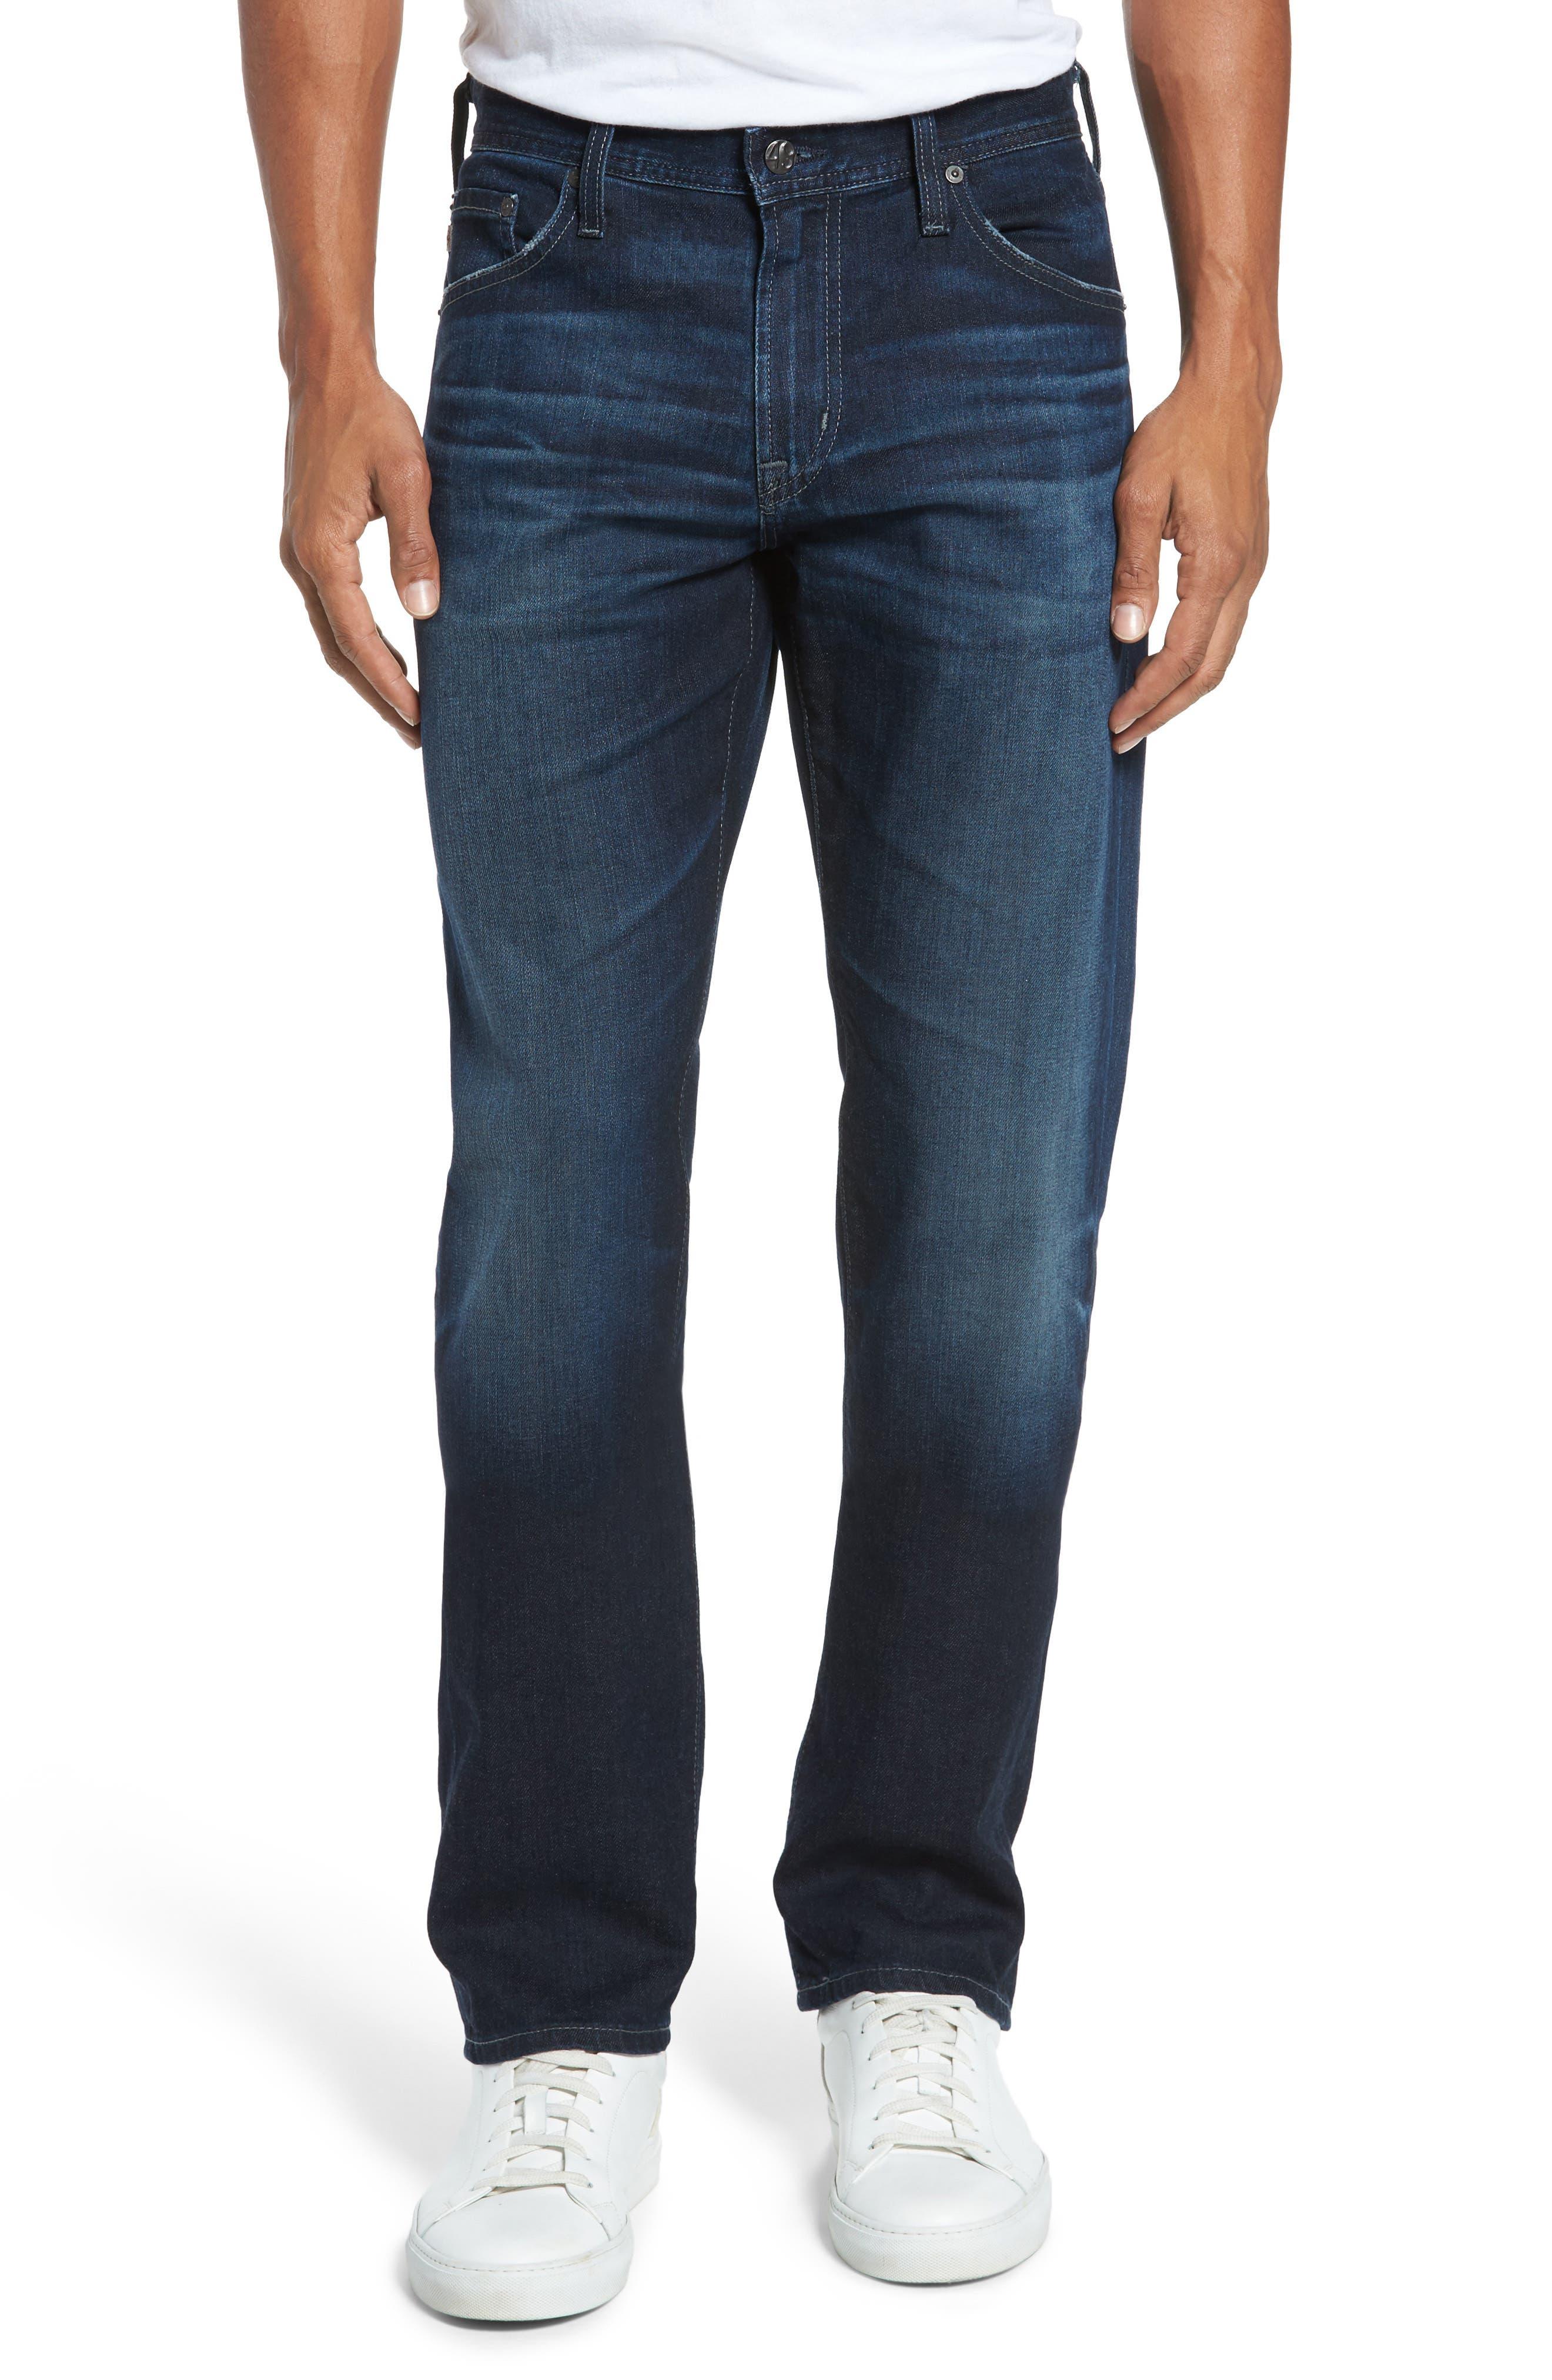 Graduate Slim Straight Fit Jeans,                             Main thumbnail 1, color,                             482